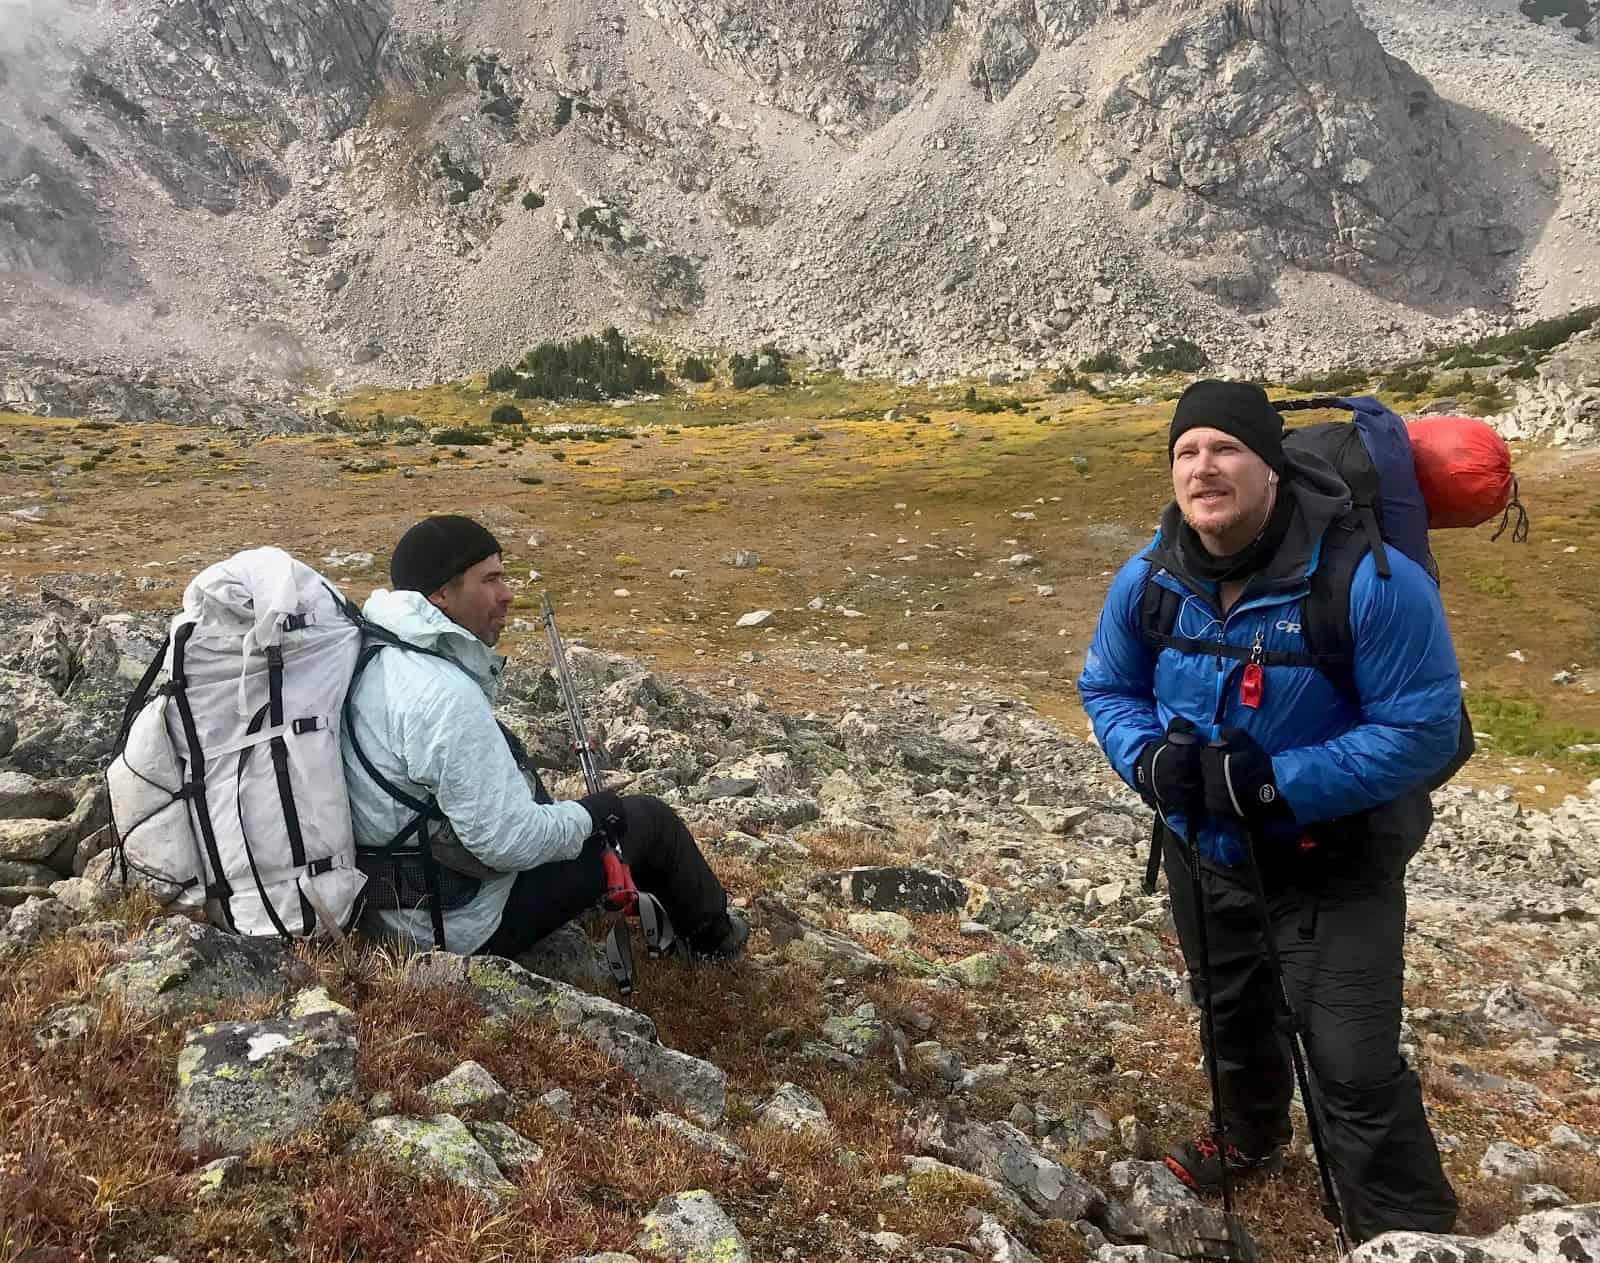 hyperlite mountain gear porter 5400 backpack review 1